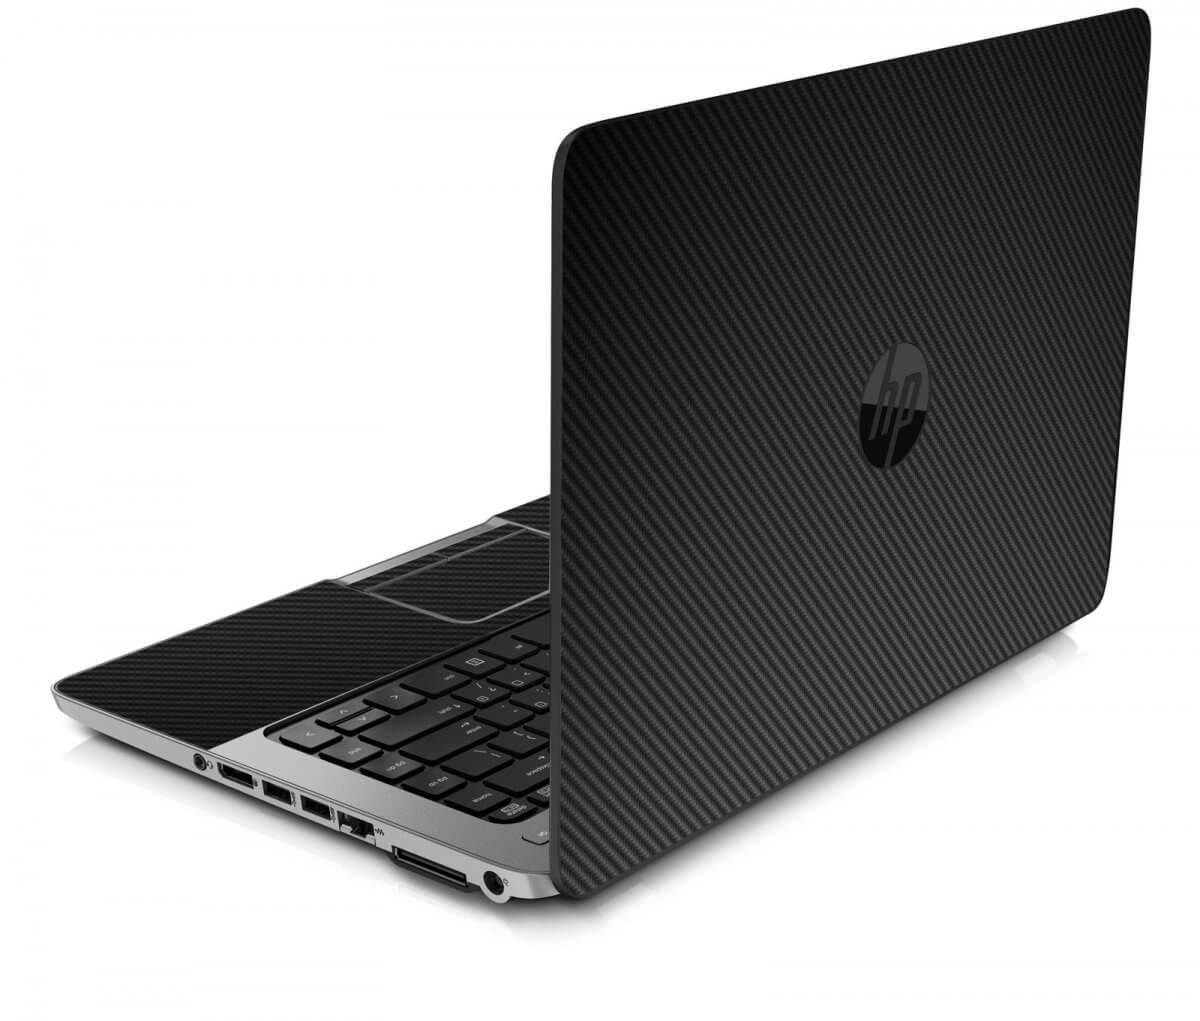 BLACK TEXTURED CARBON FIBER HP ProBook 850 G1 Skin